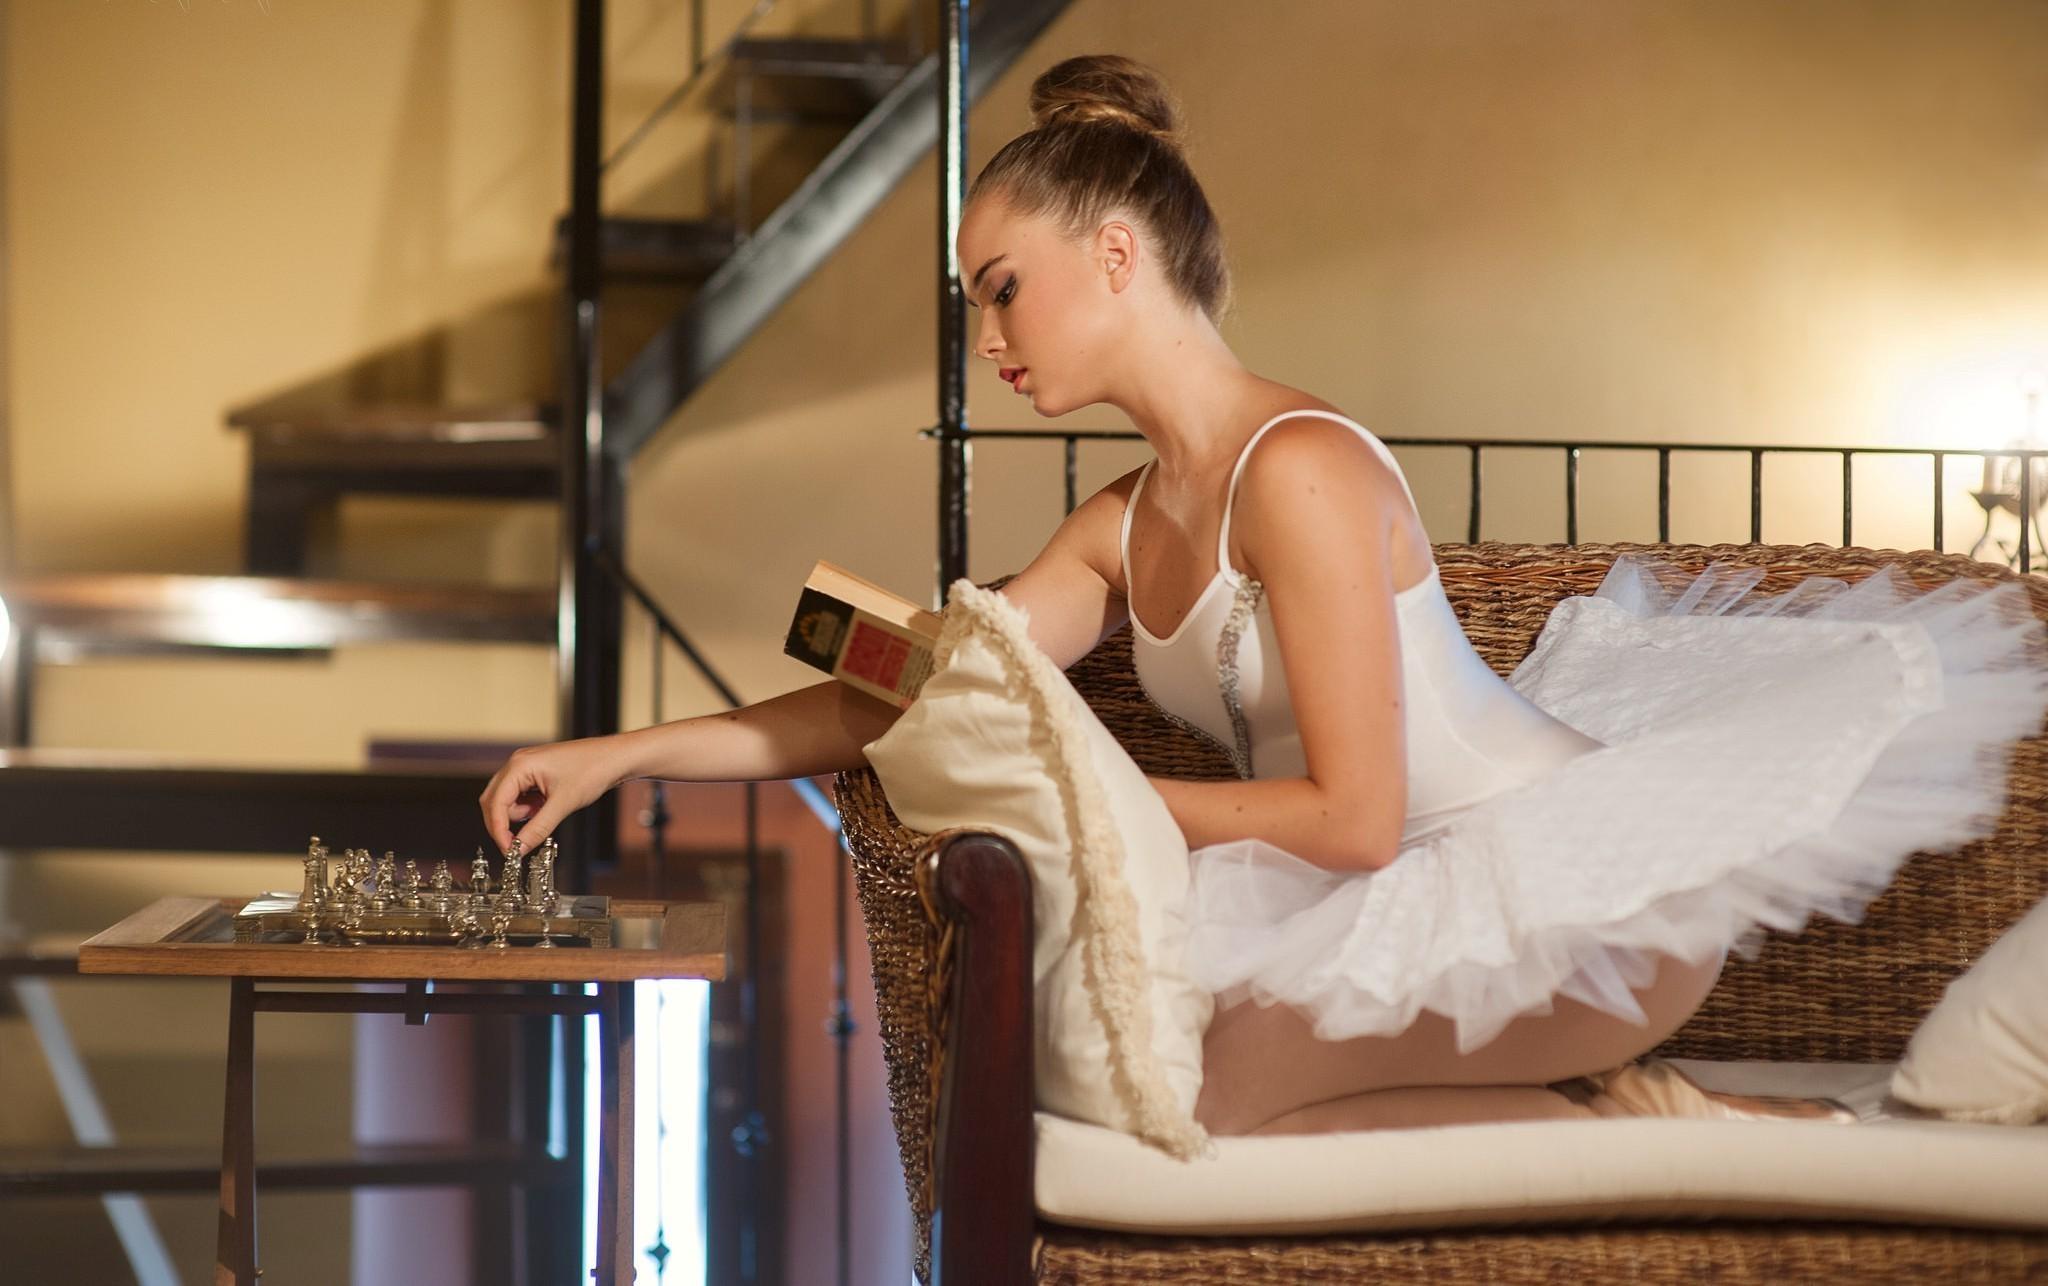 wallpaper women model sitting books reading ballerina person